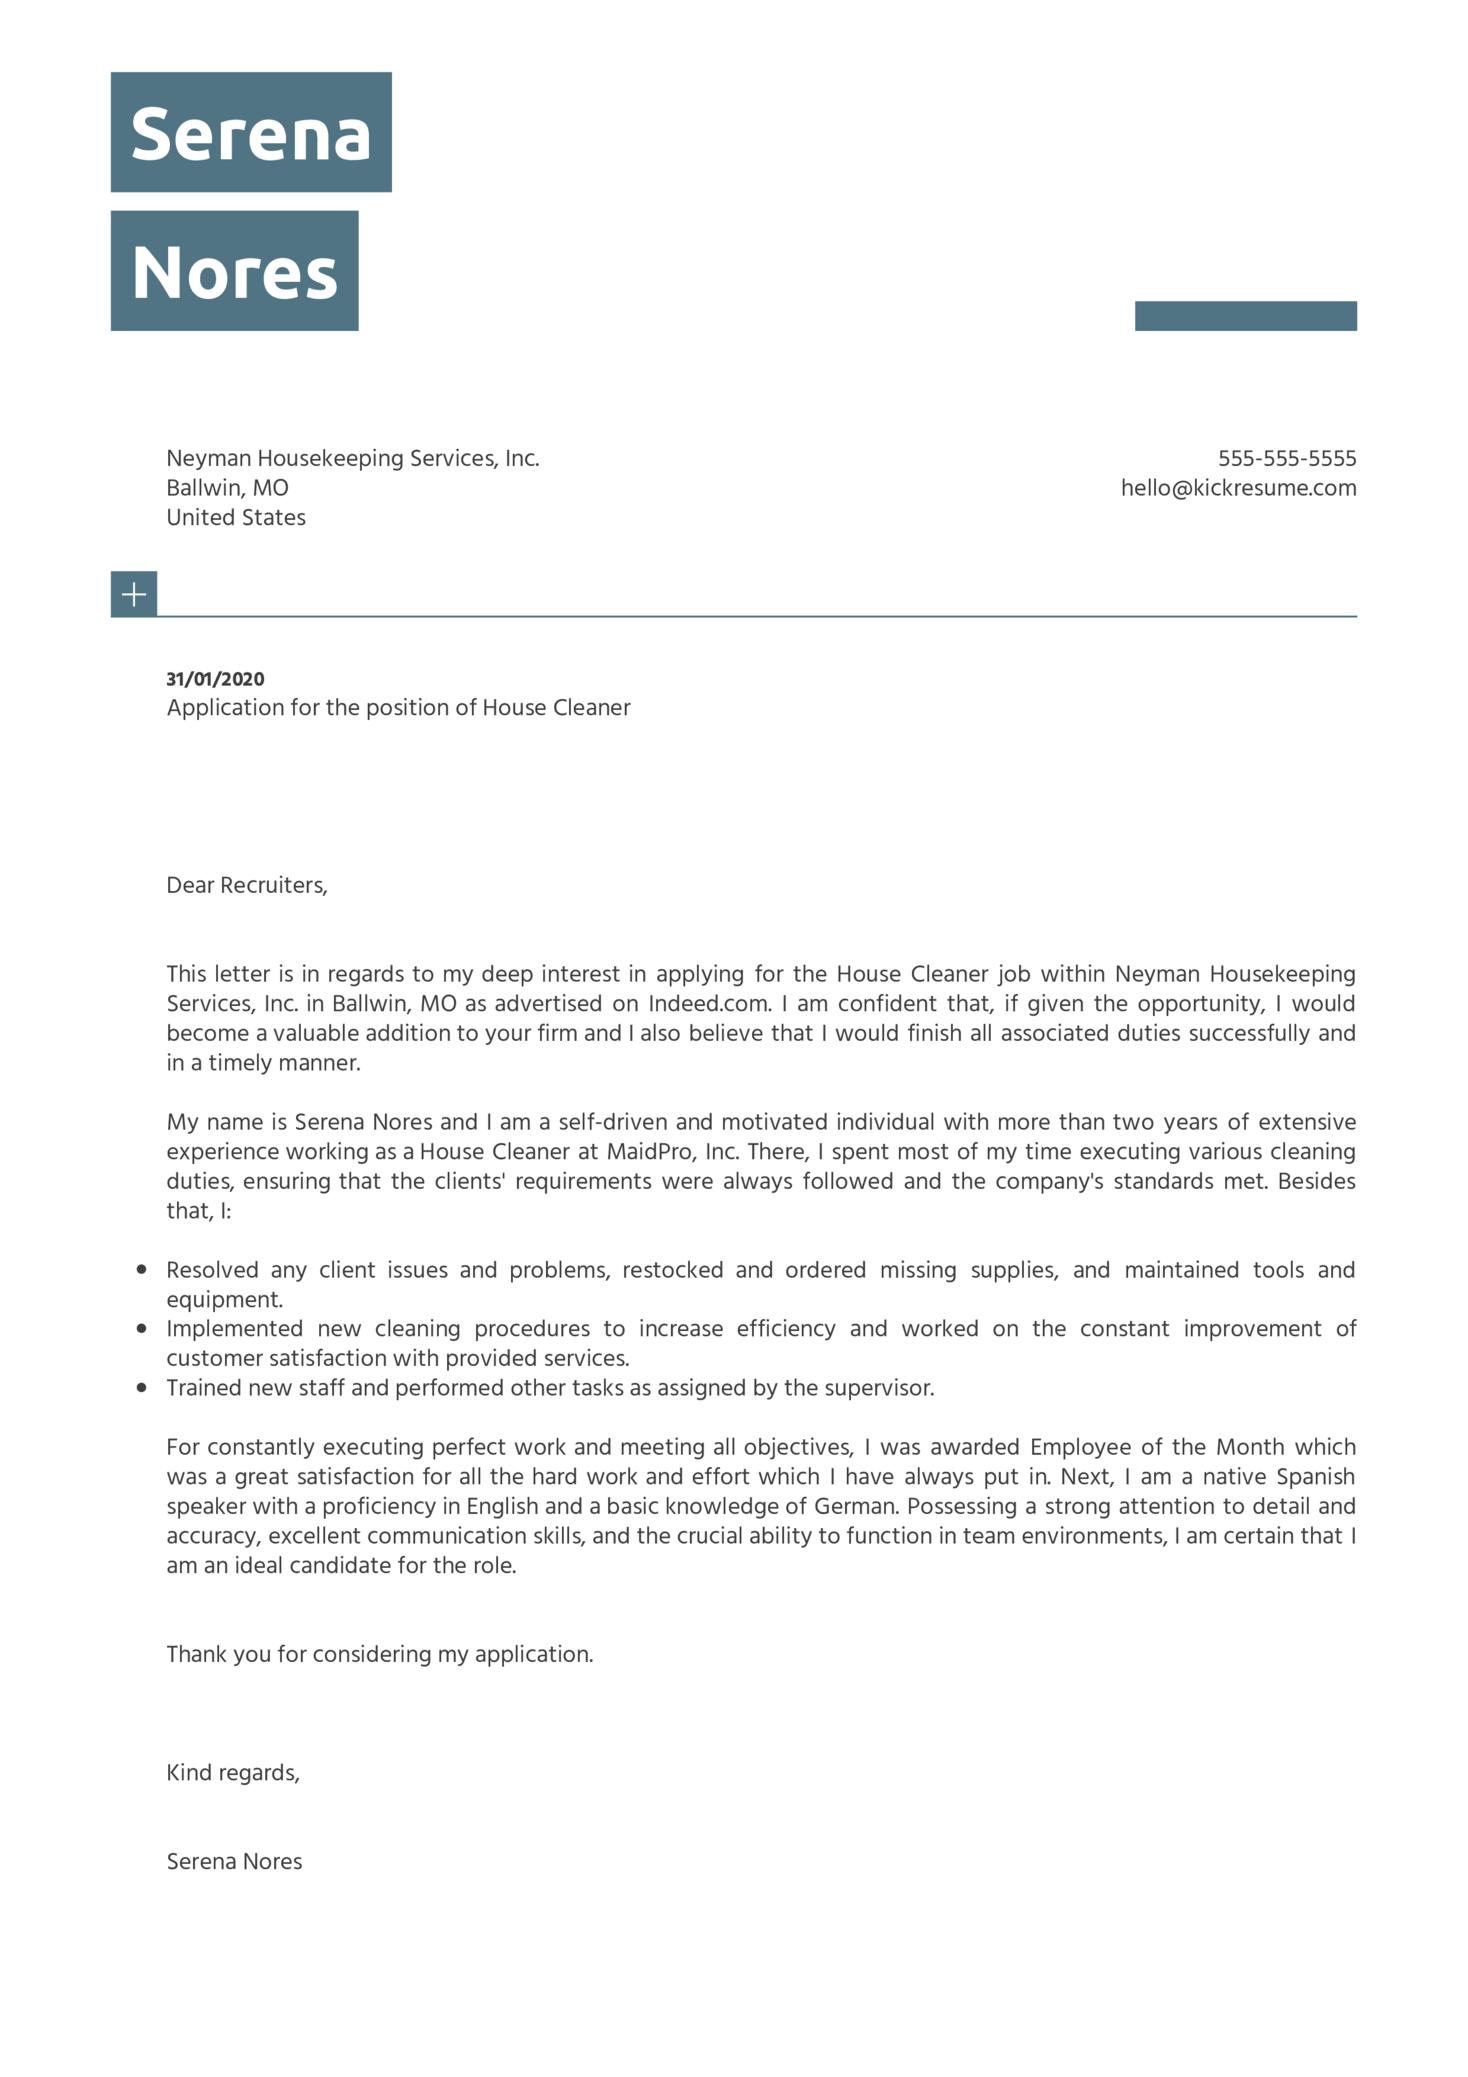 House Cleaner Cover Letter Sample